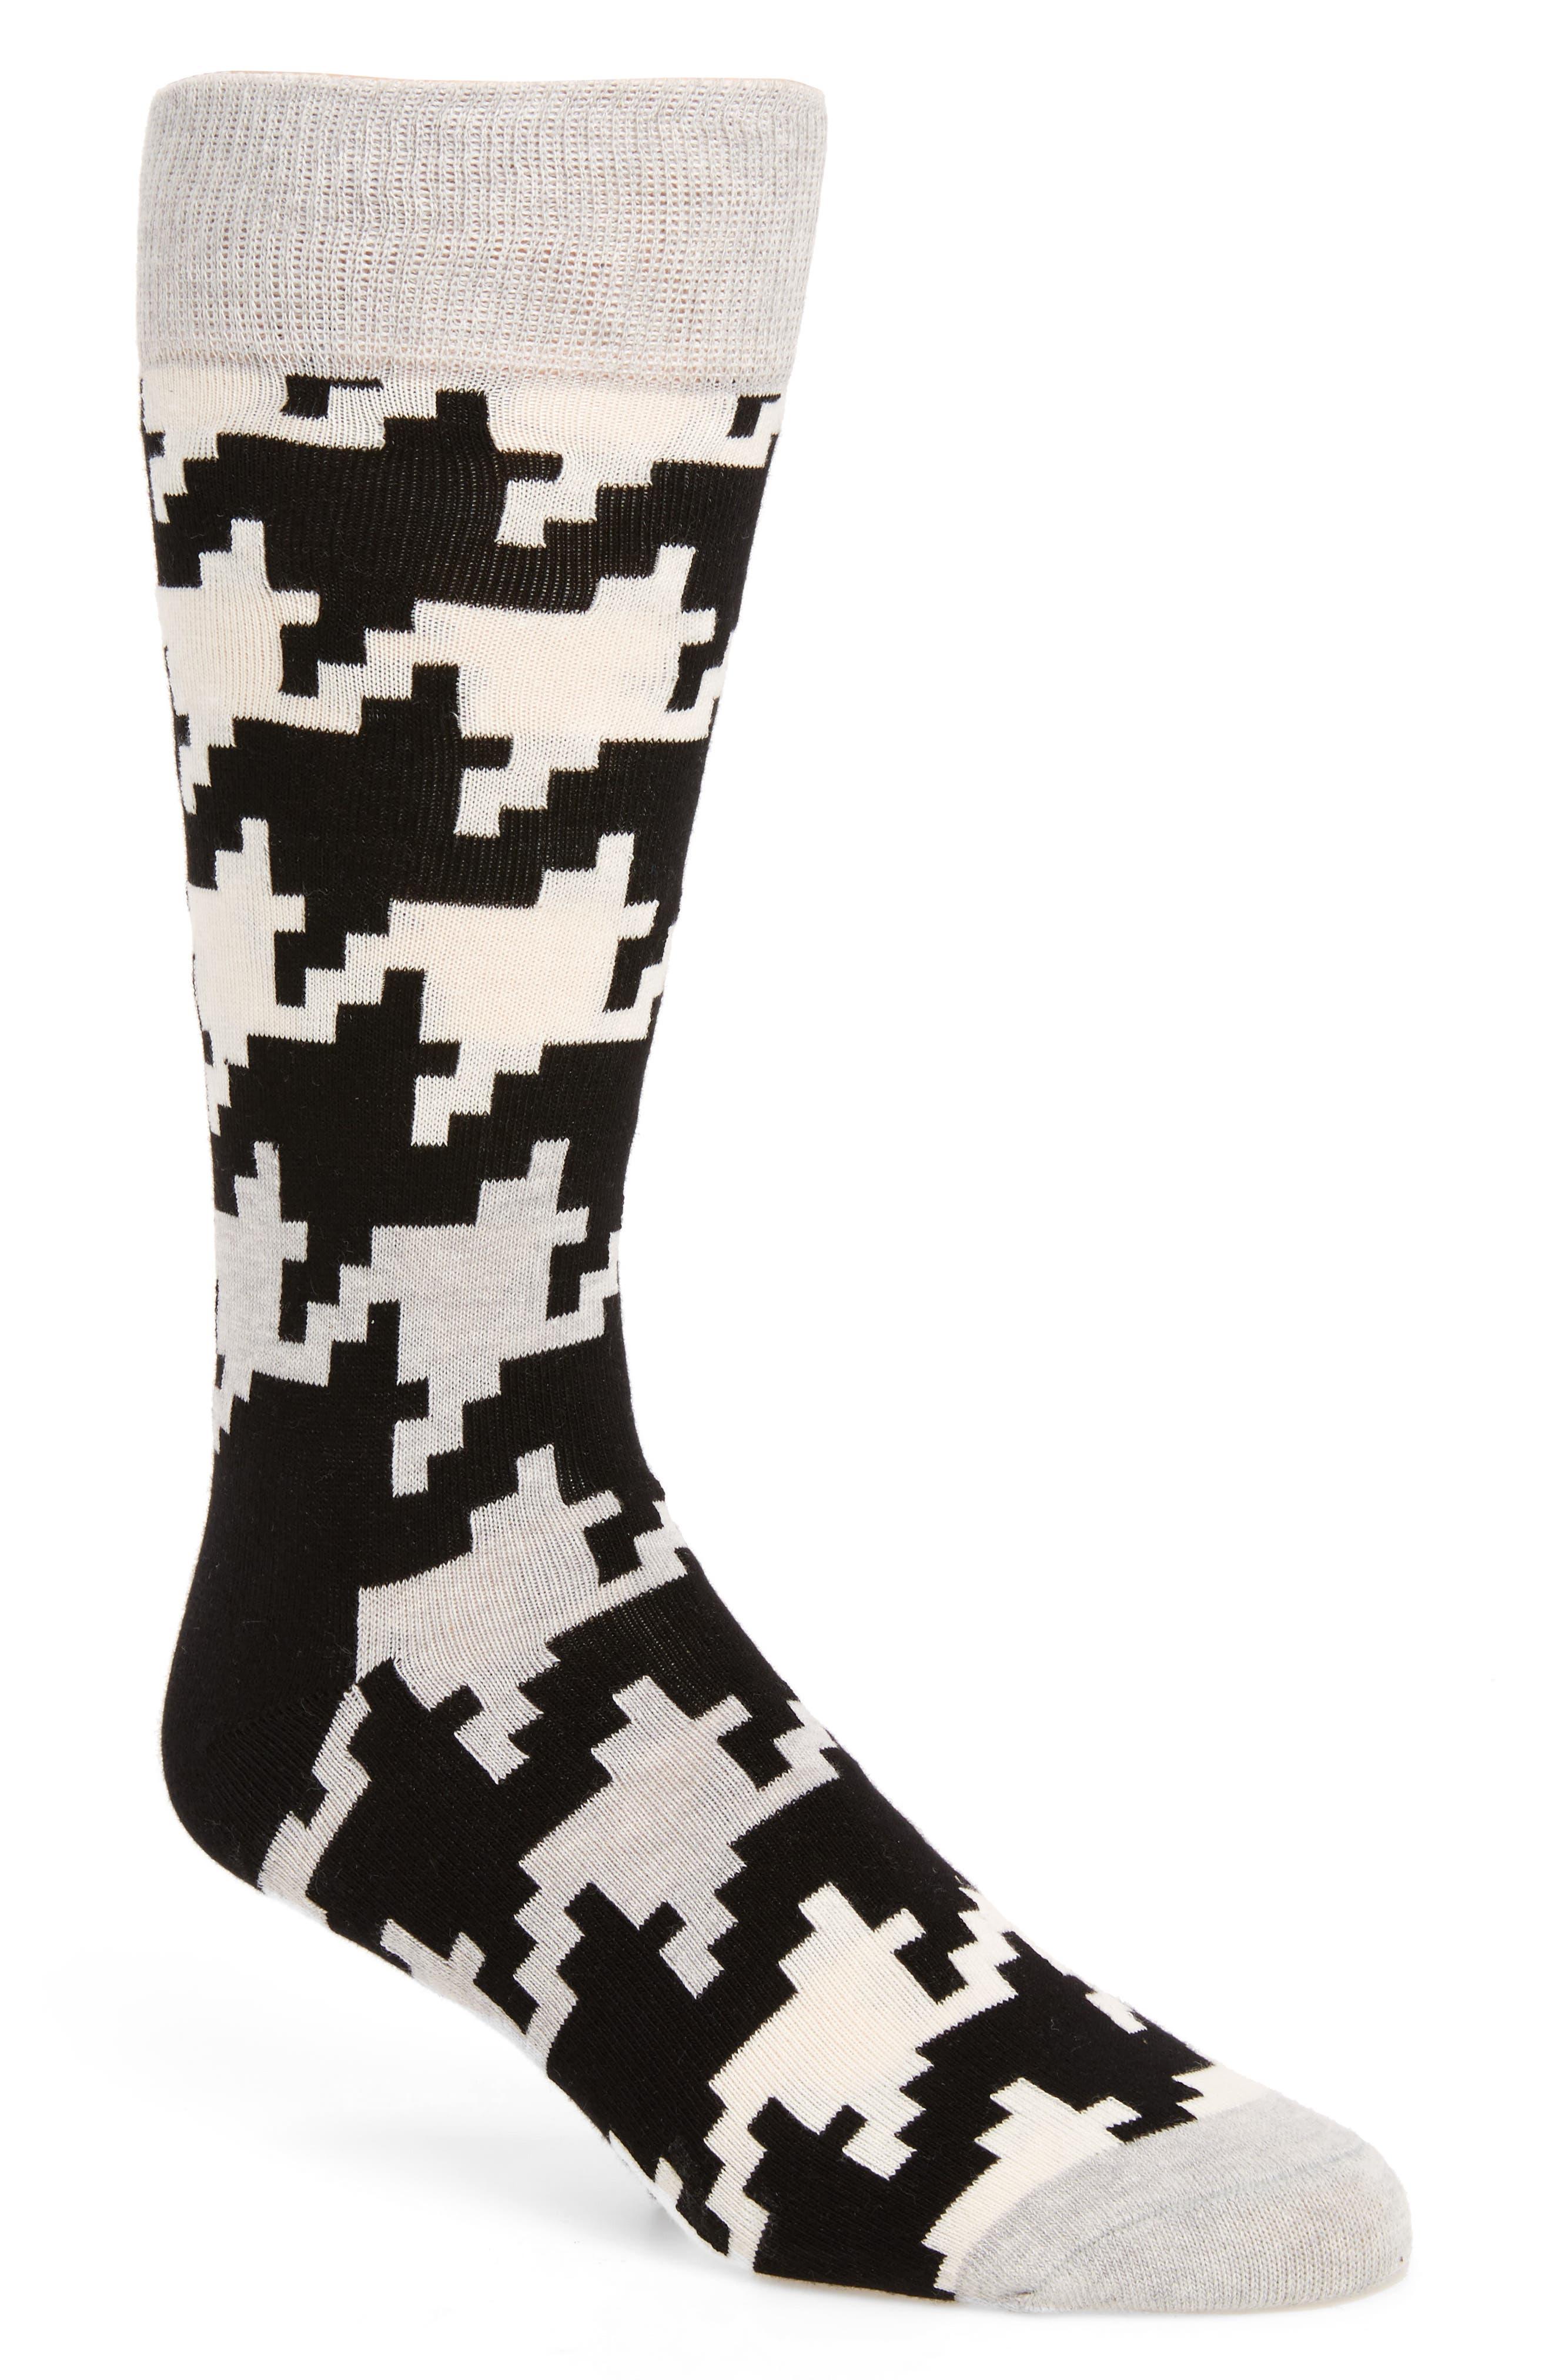 Happy Socks Digital Houndstooth Socks